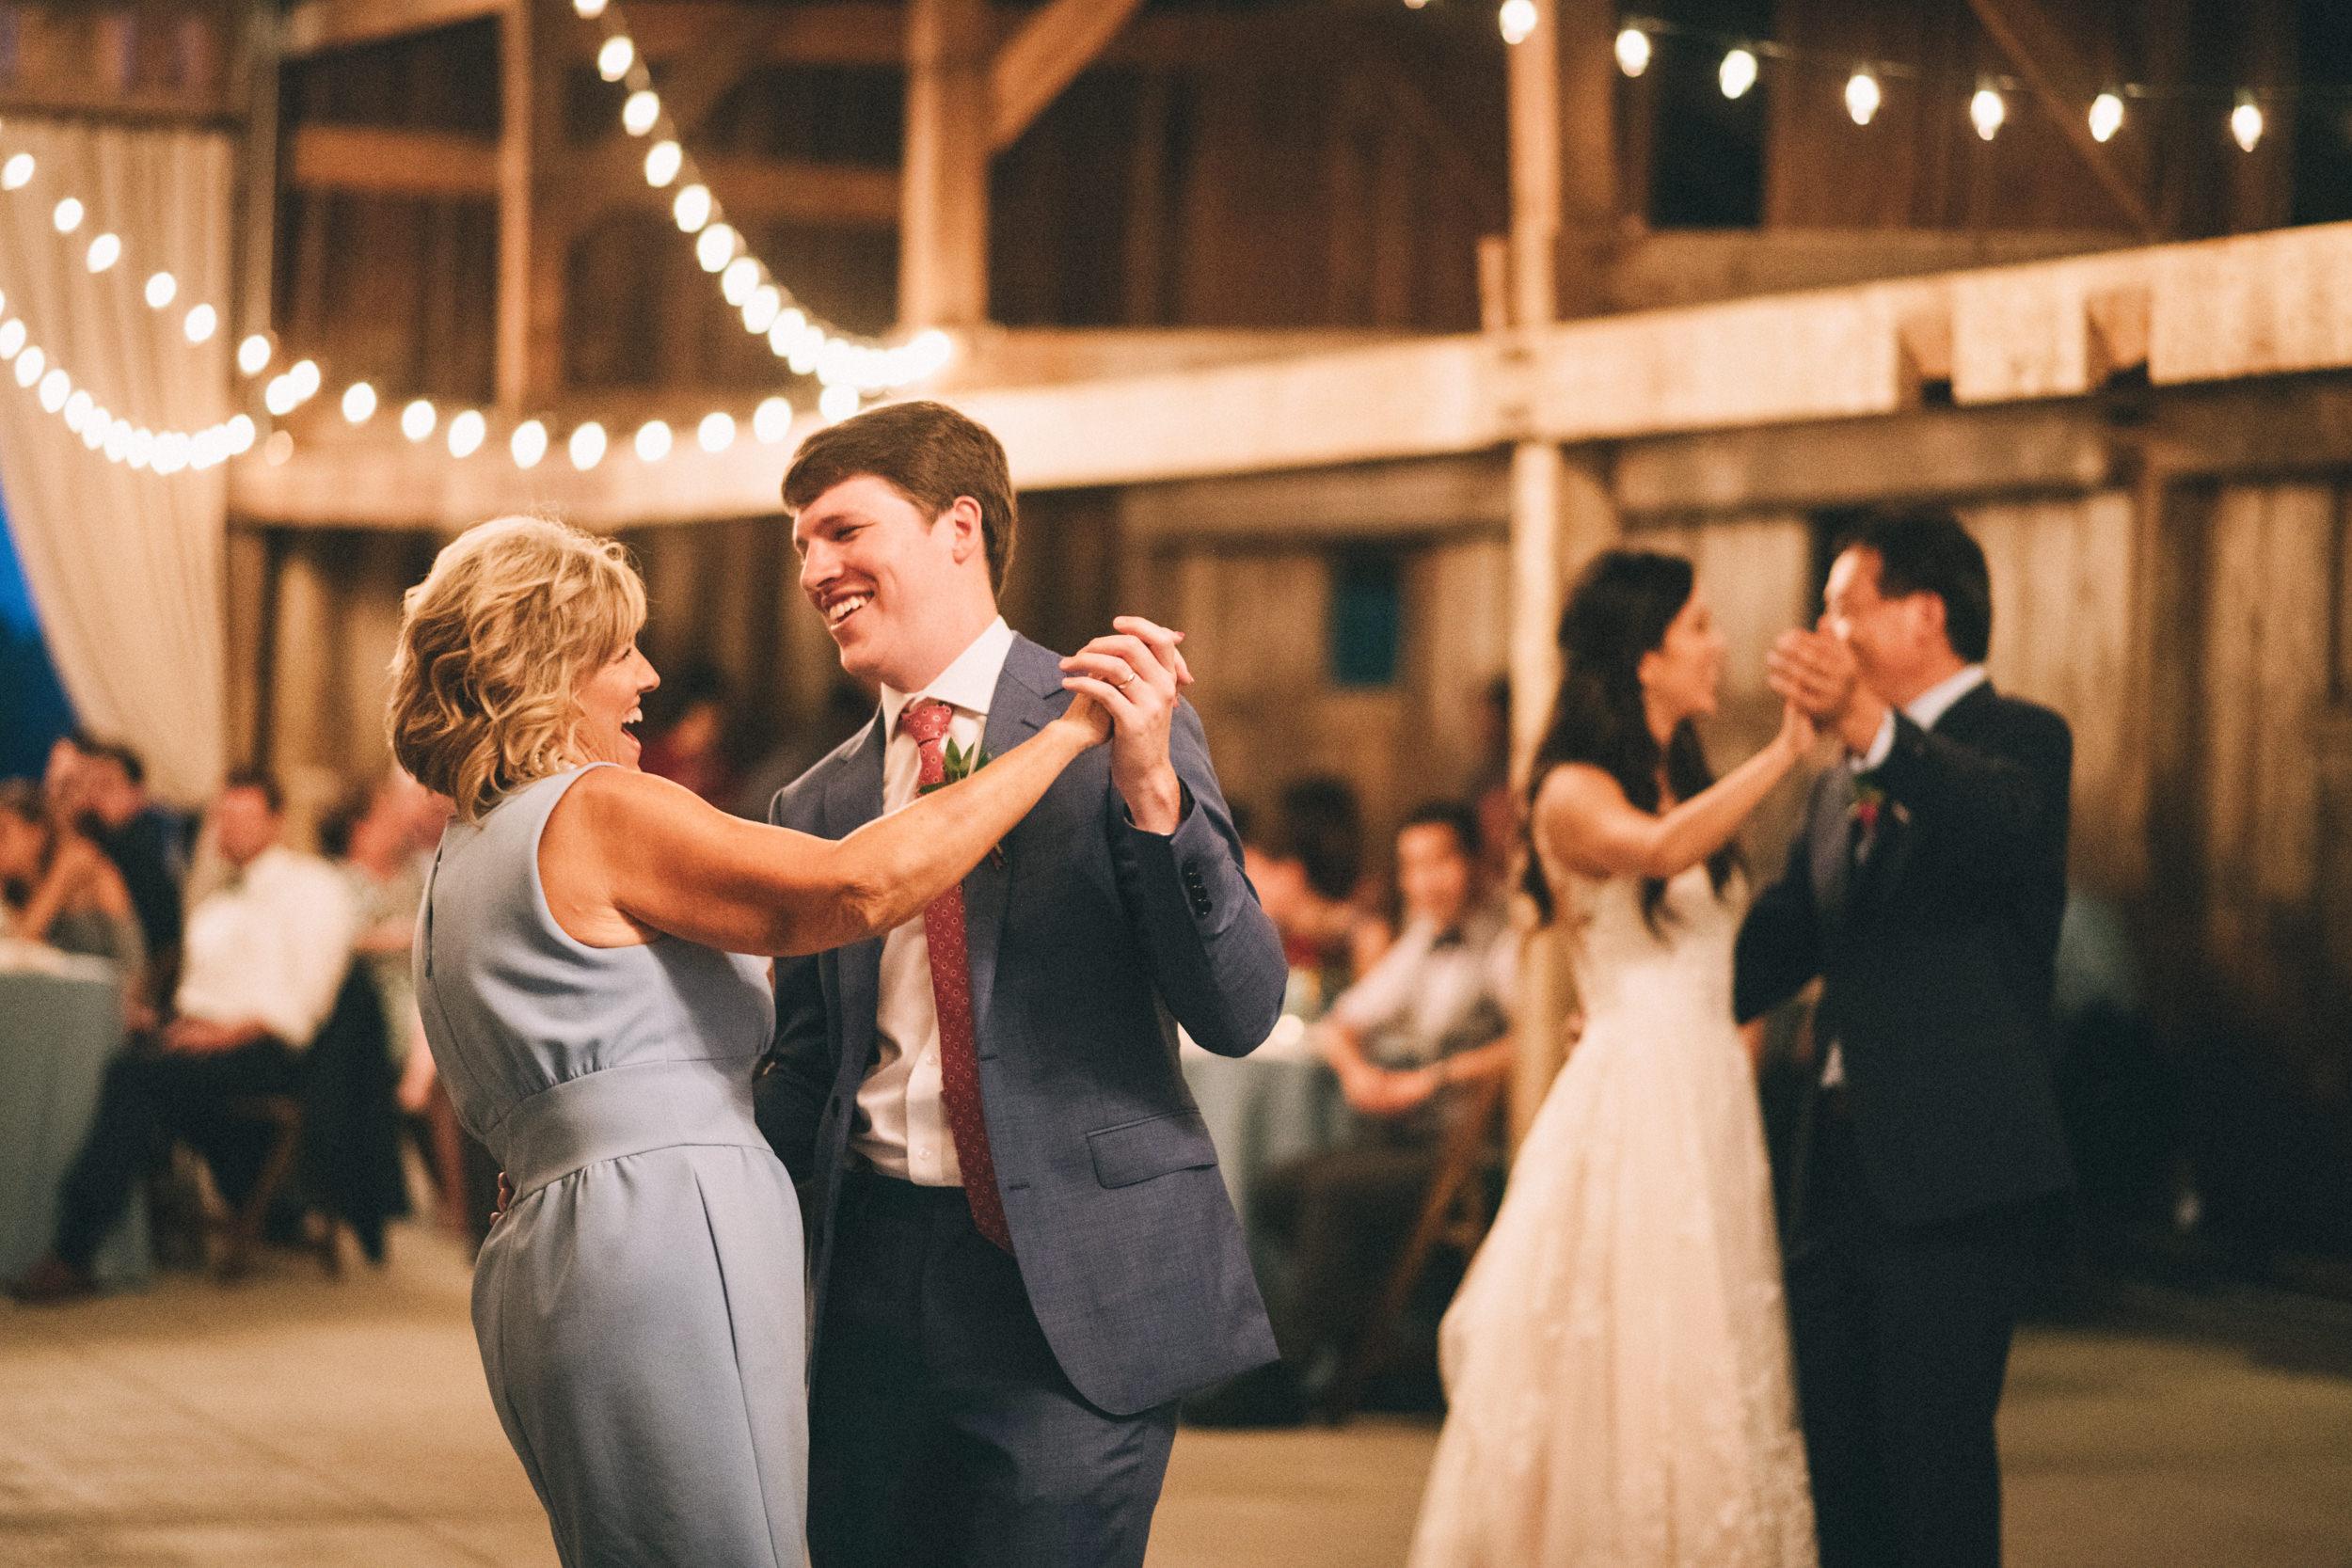 Louisville-Kentucky-Wedding-and-Elopement-Photographer-Sarah-Katherine-Davis-Photography-Summer-Jewel-Toned-Wedding-Chineese-Tea-Ceremony-Warrenwood-Manor-Danville-942.jpg